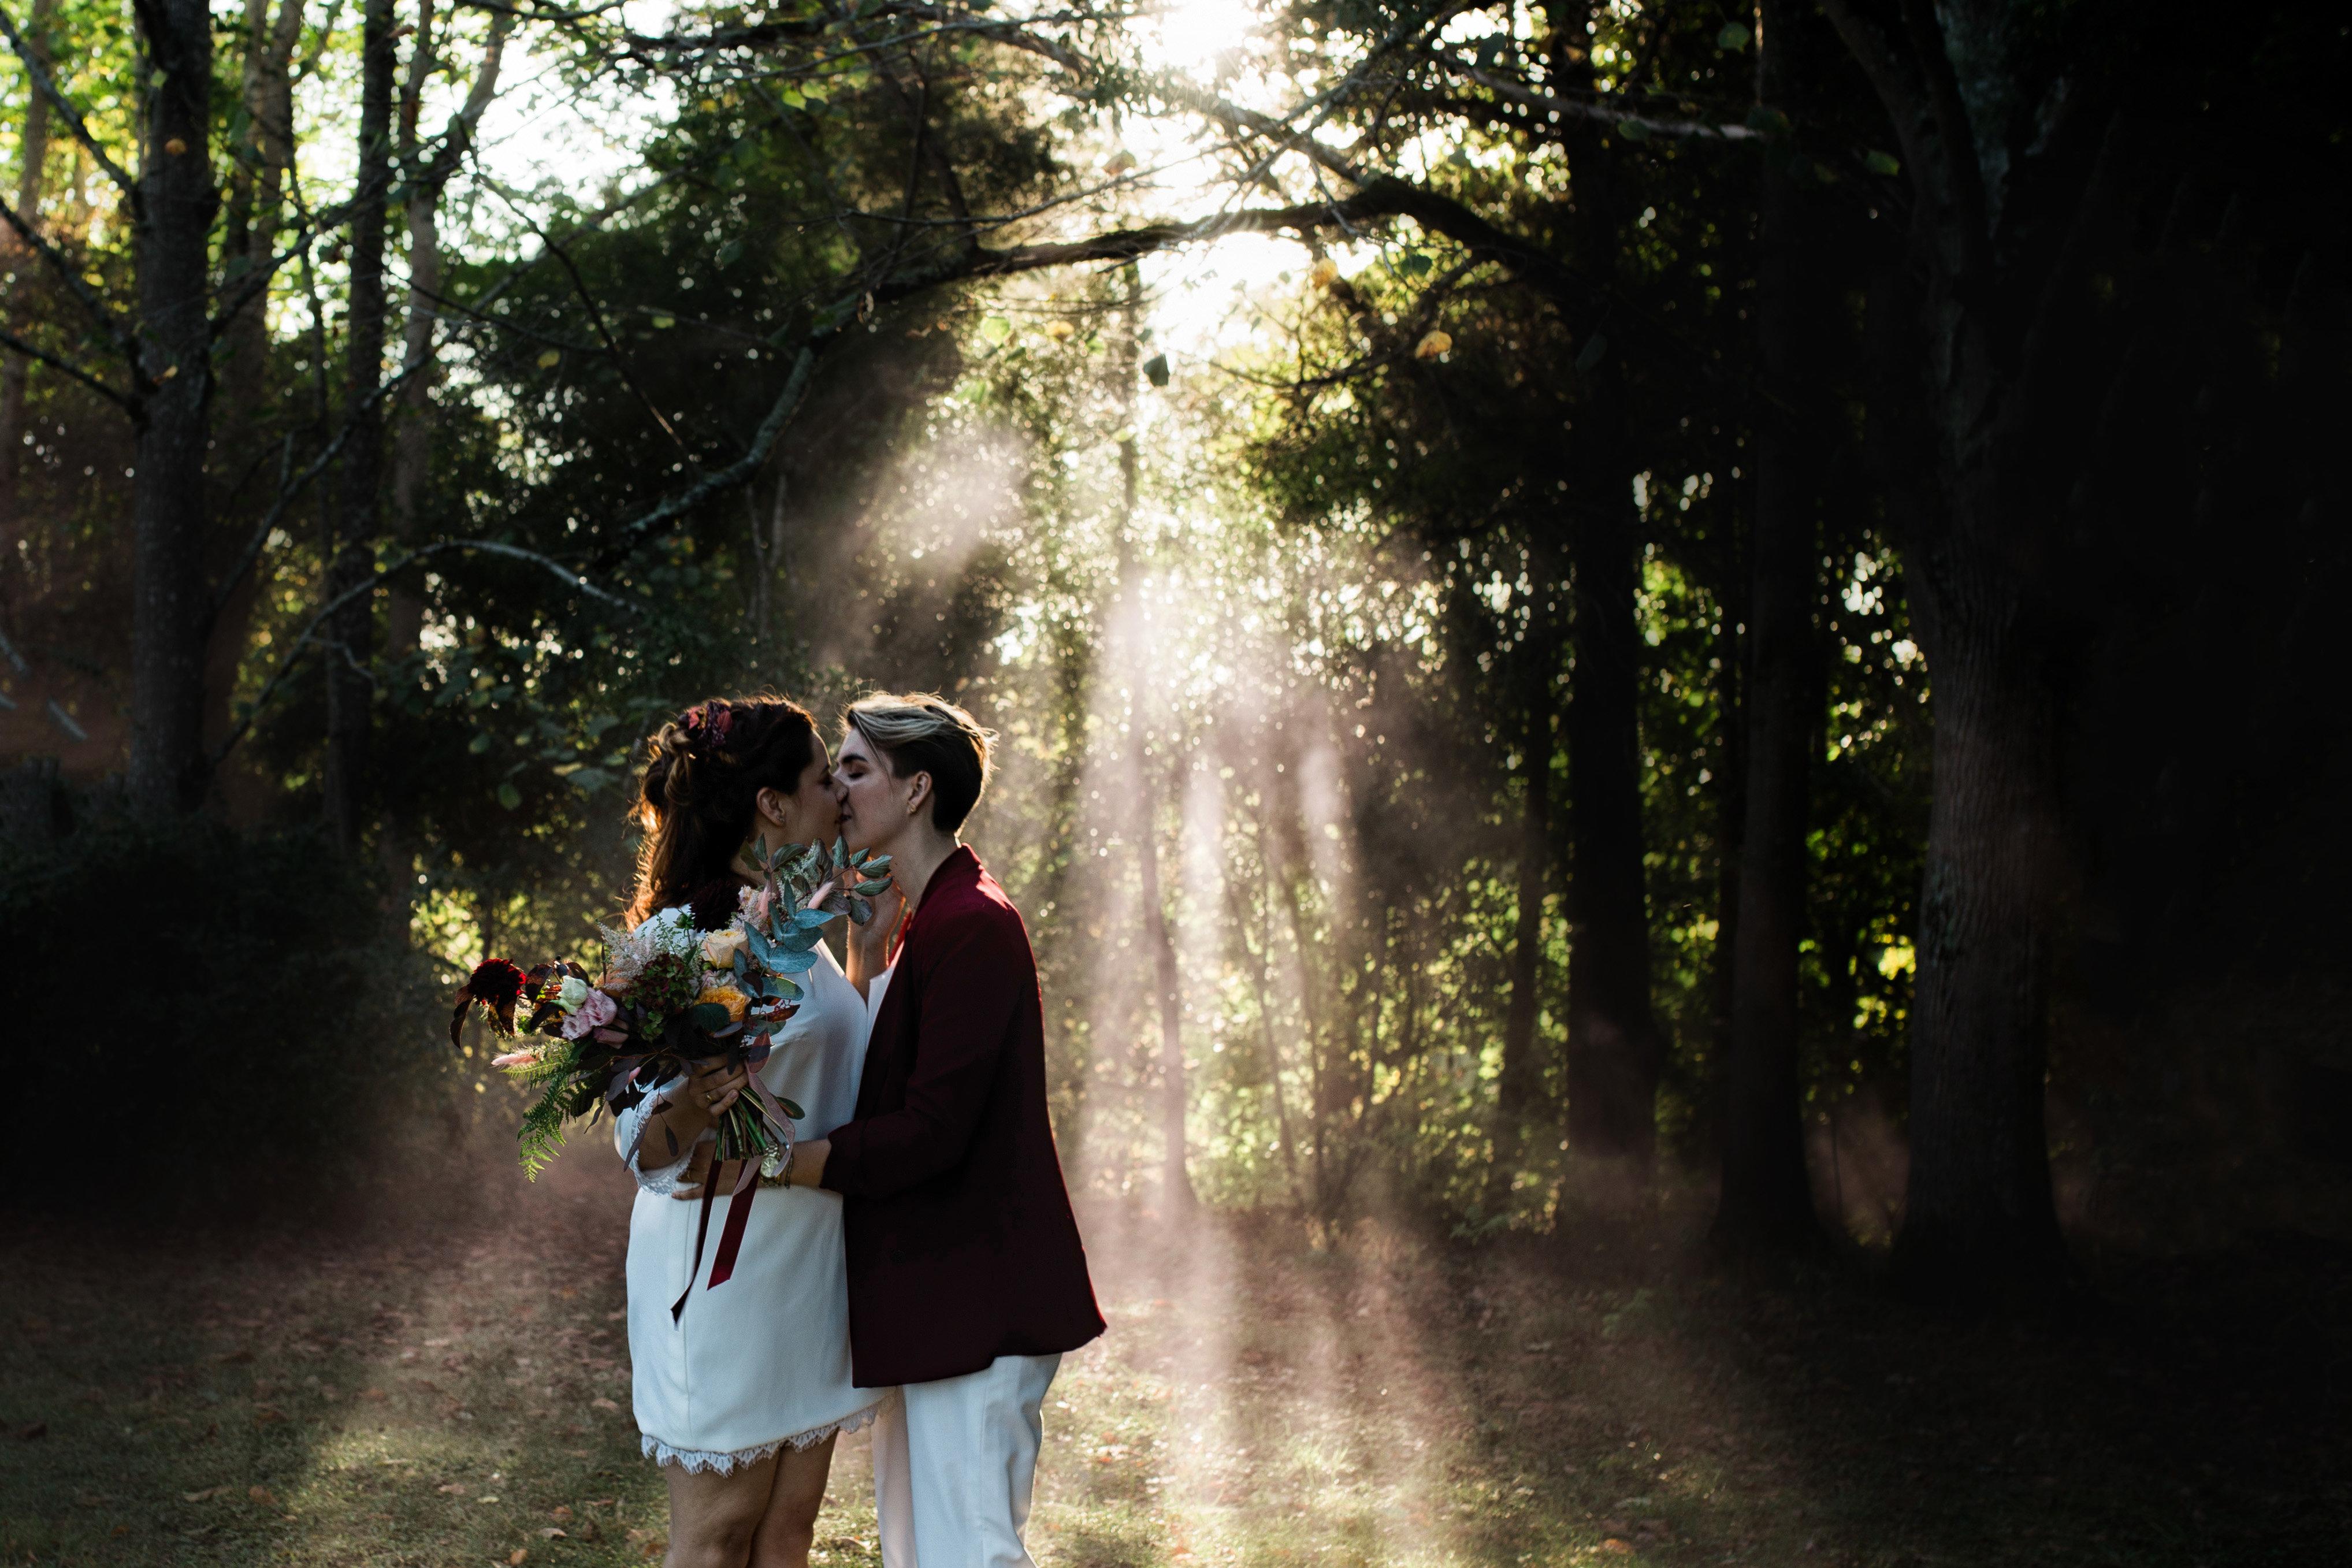 Mariage automne - Eva Martinez